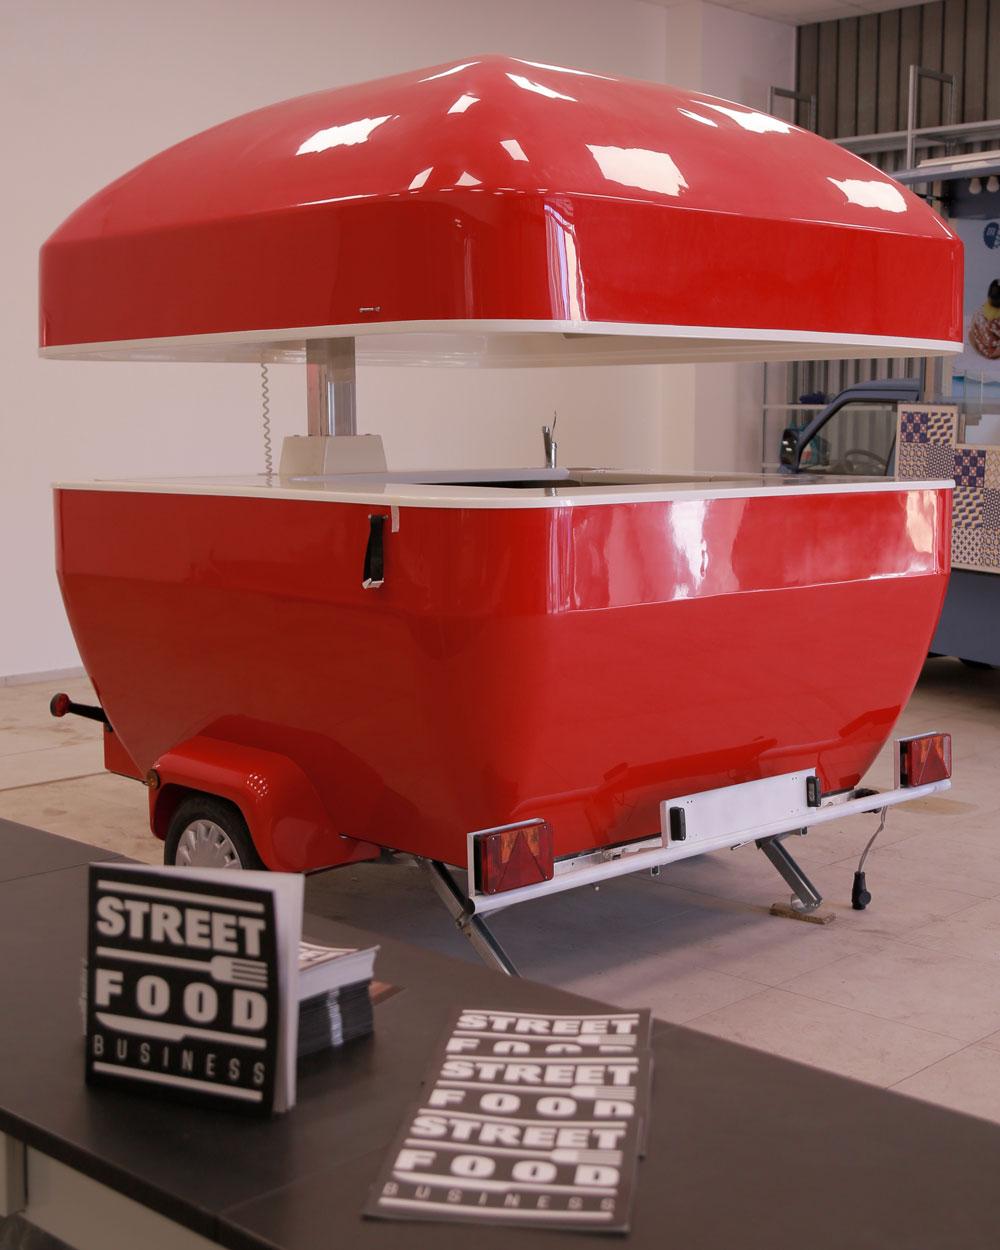 streetfoodbusiness-rimorchio-florens2x2-2